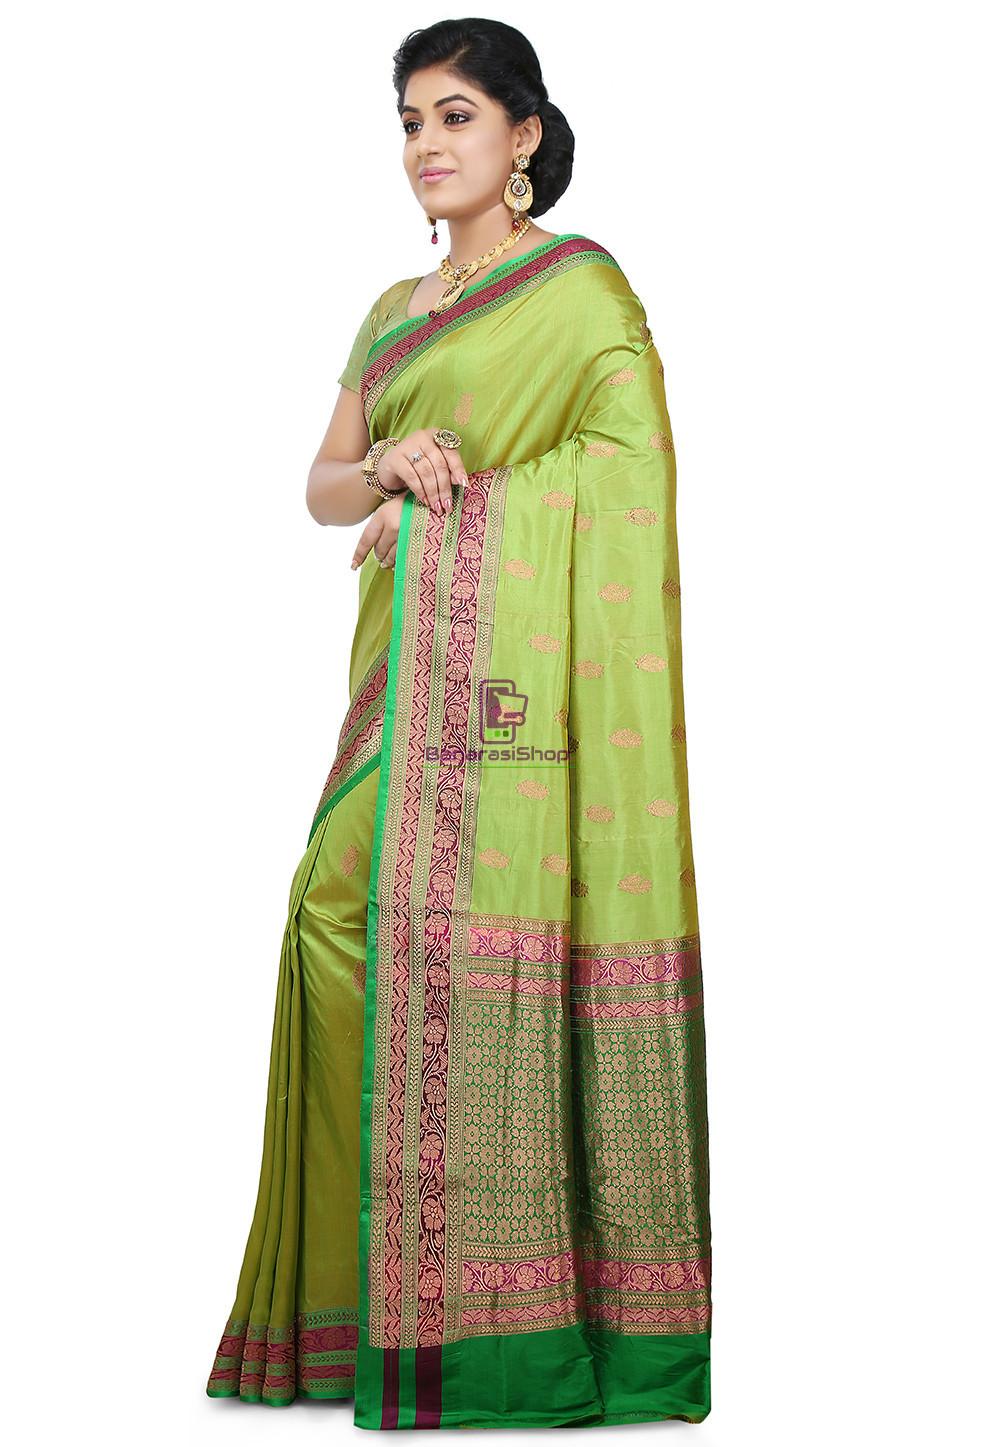 Banarasi Katan Silk Handloom Saree in Light Green 5